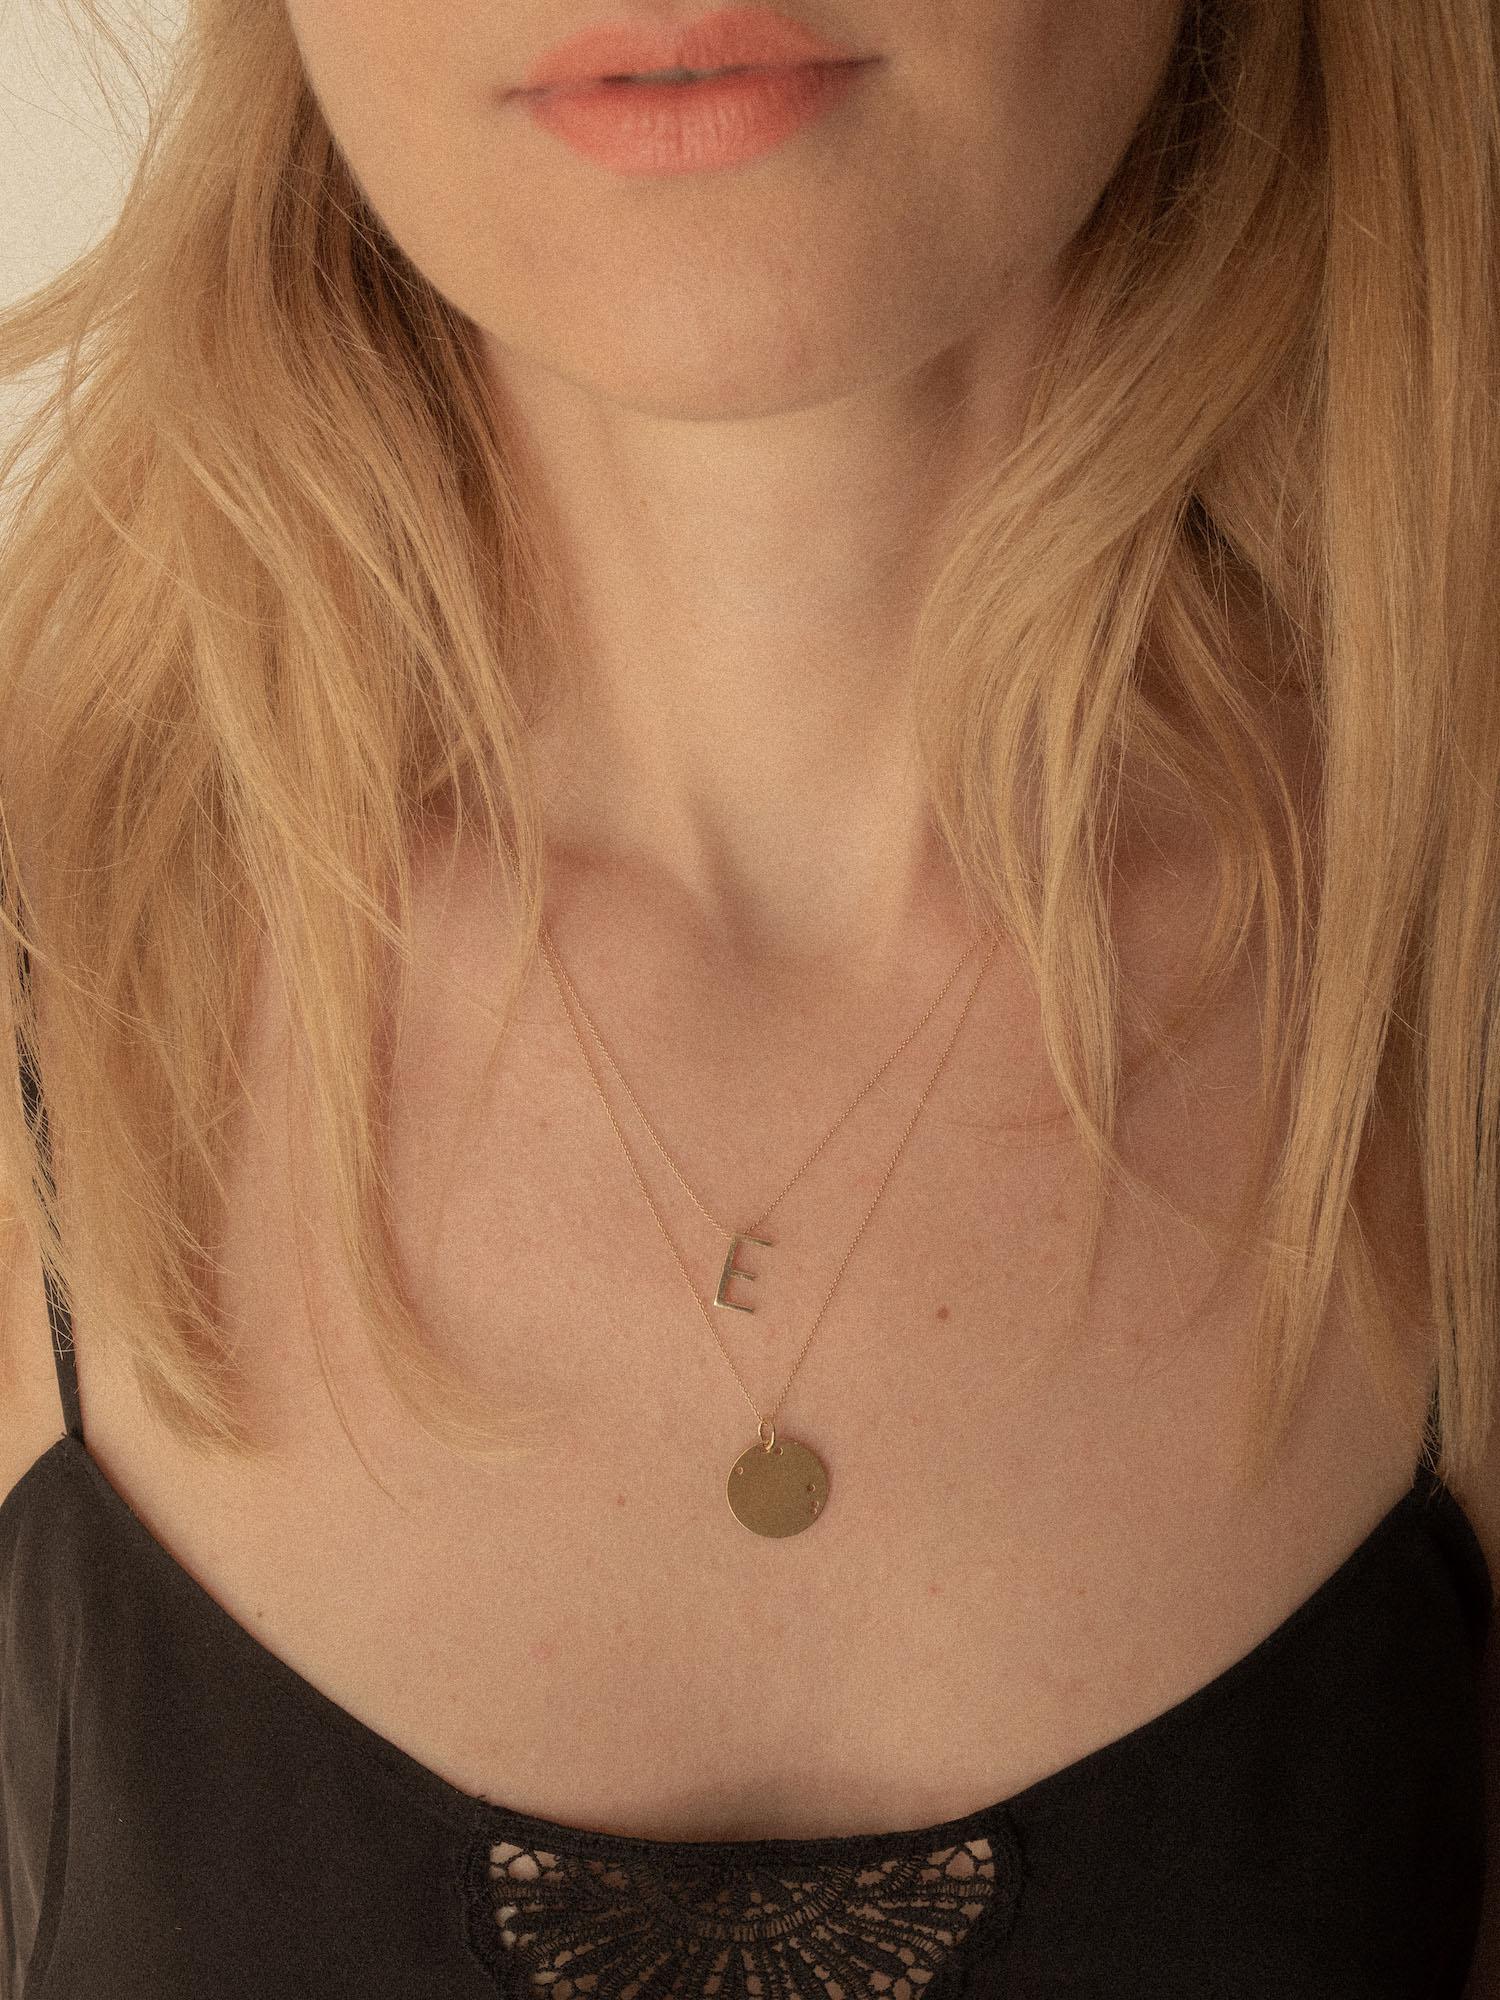 Beautyblog Bare Minds Lippenstifte für helle Haut 5